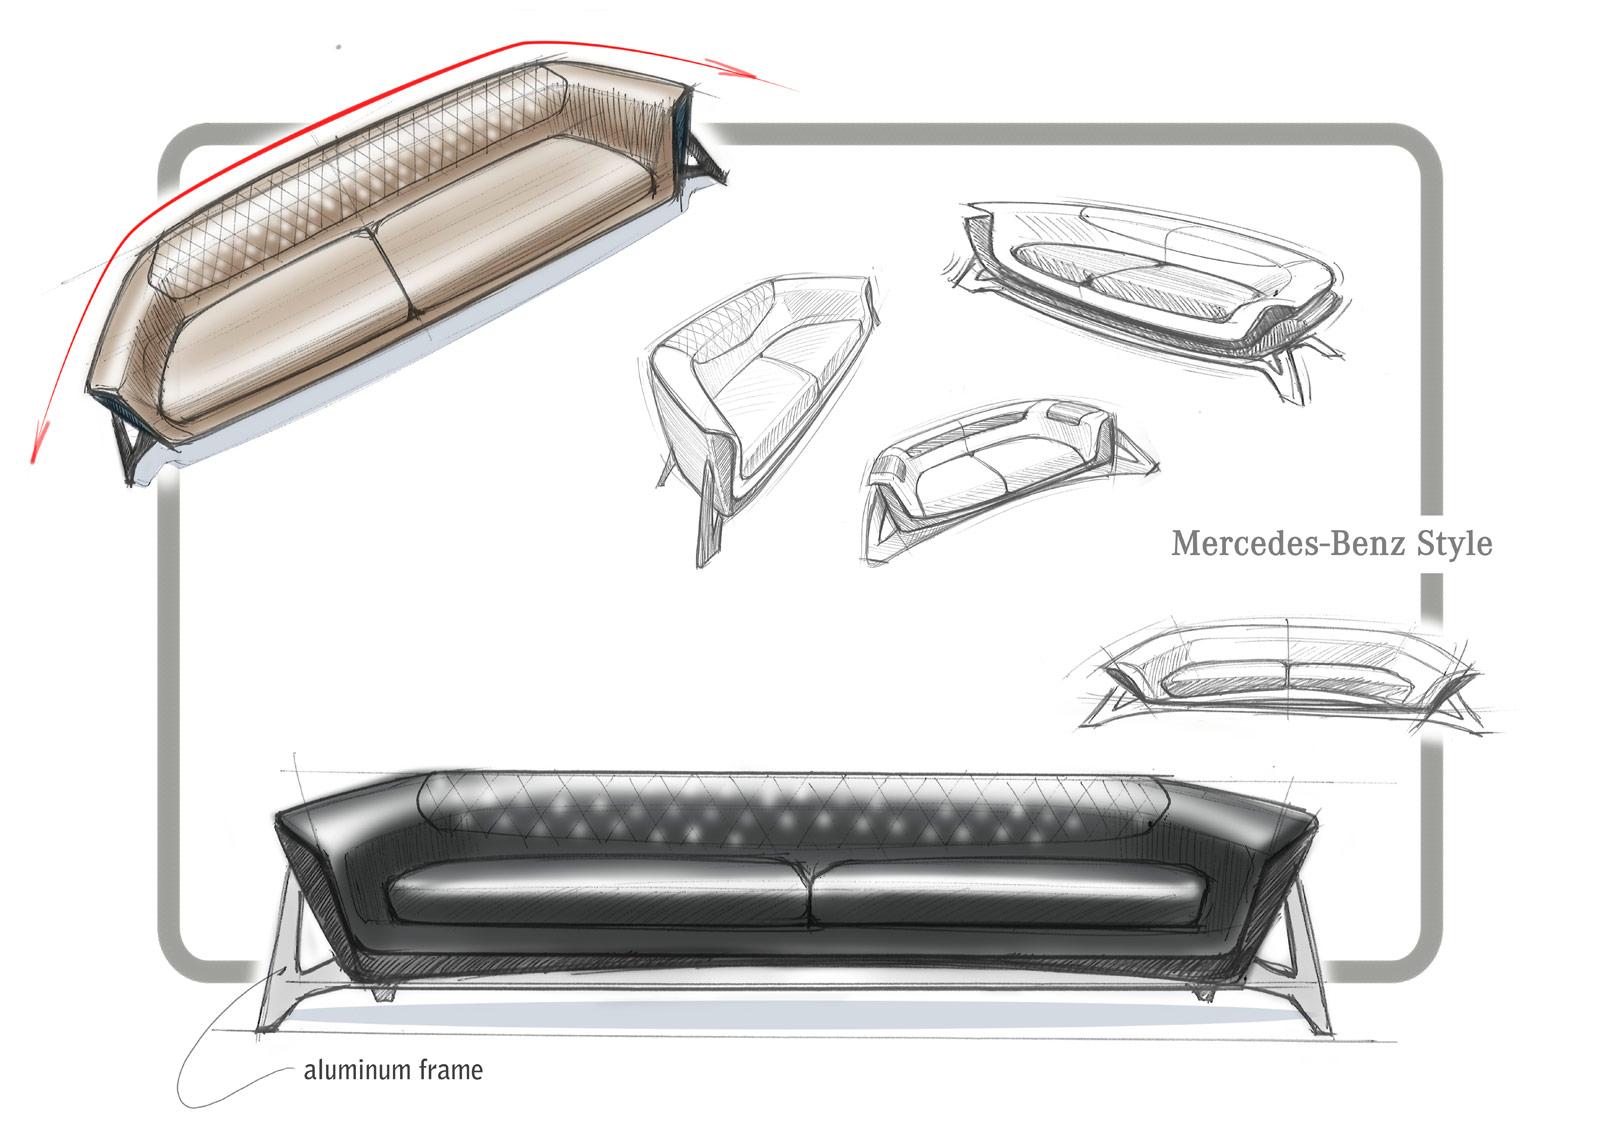 Mercedes Benz Sofa Class Mbs 001 Design Sketch Car Body Design